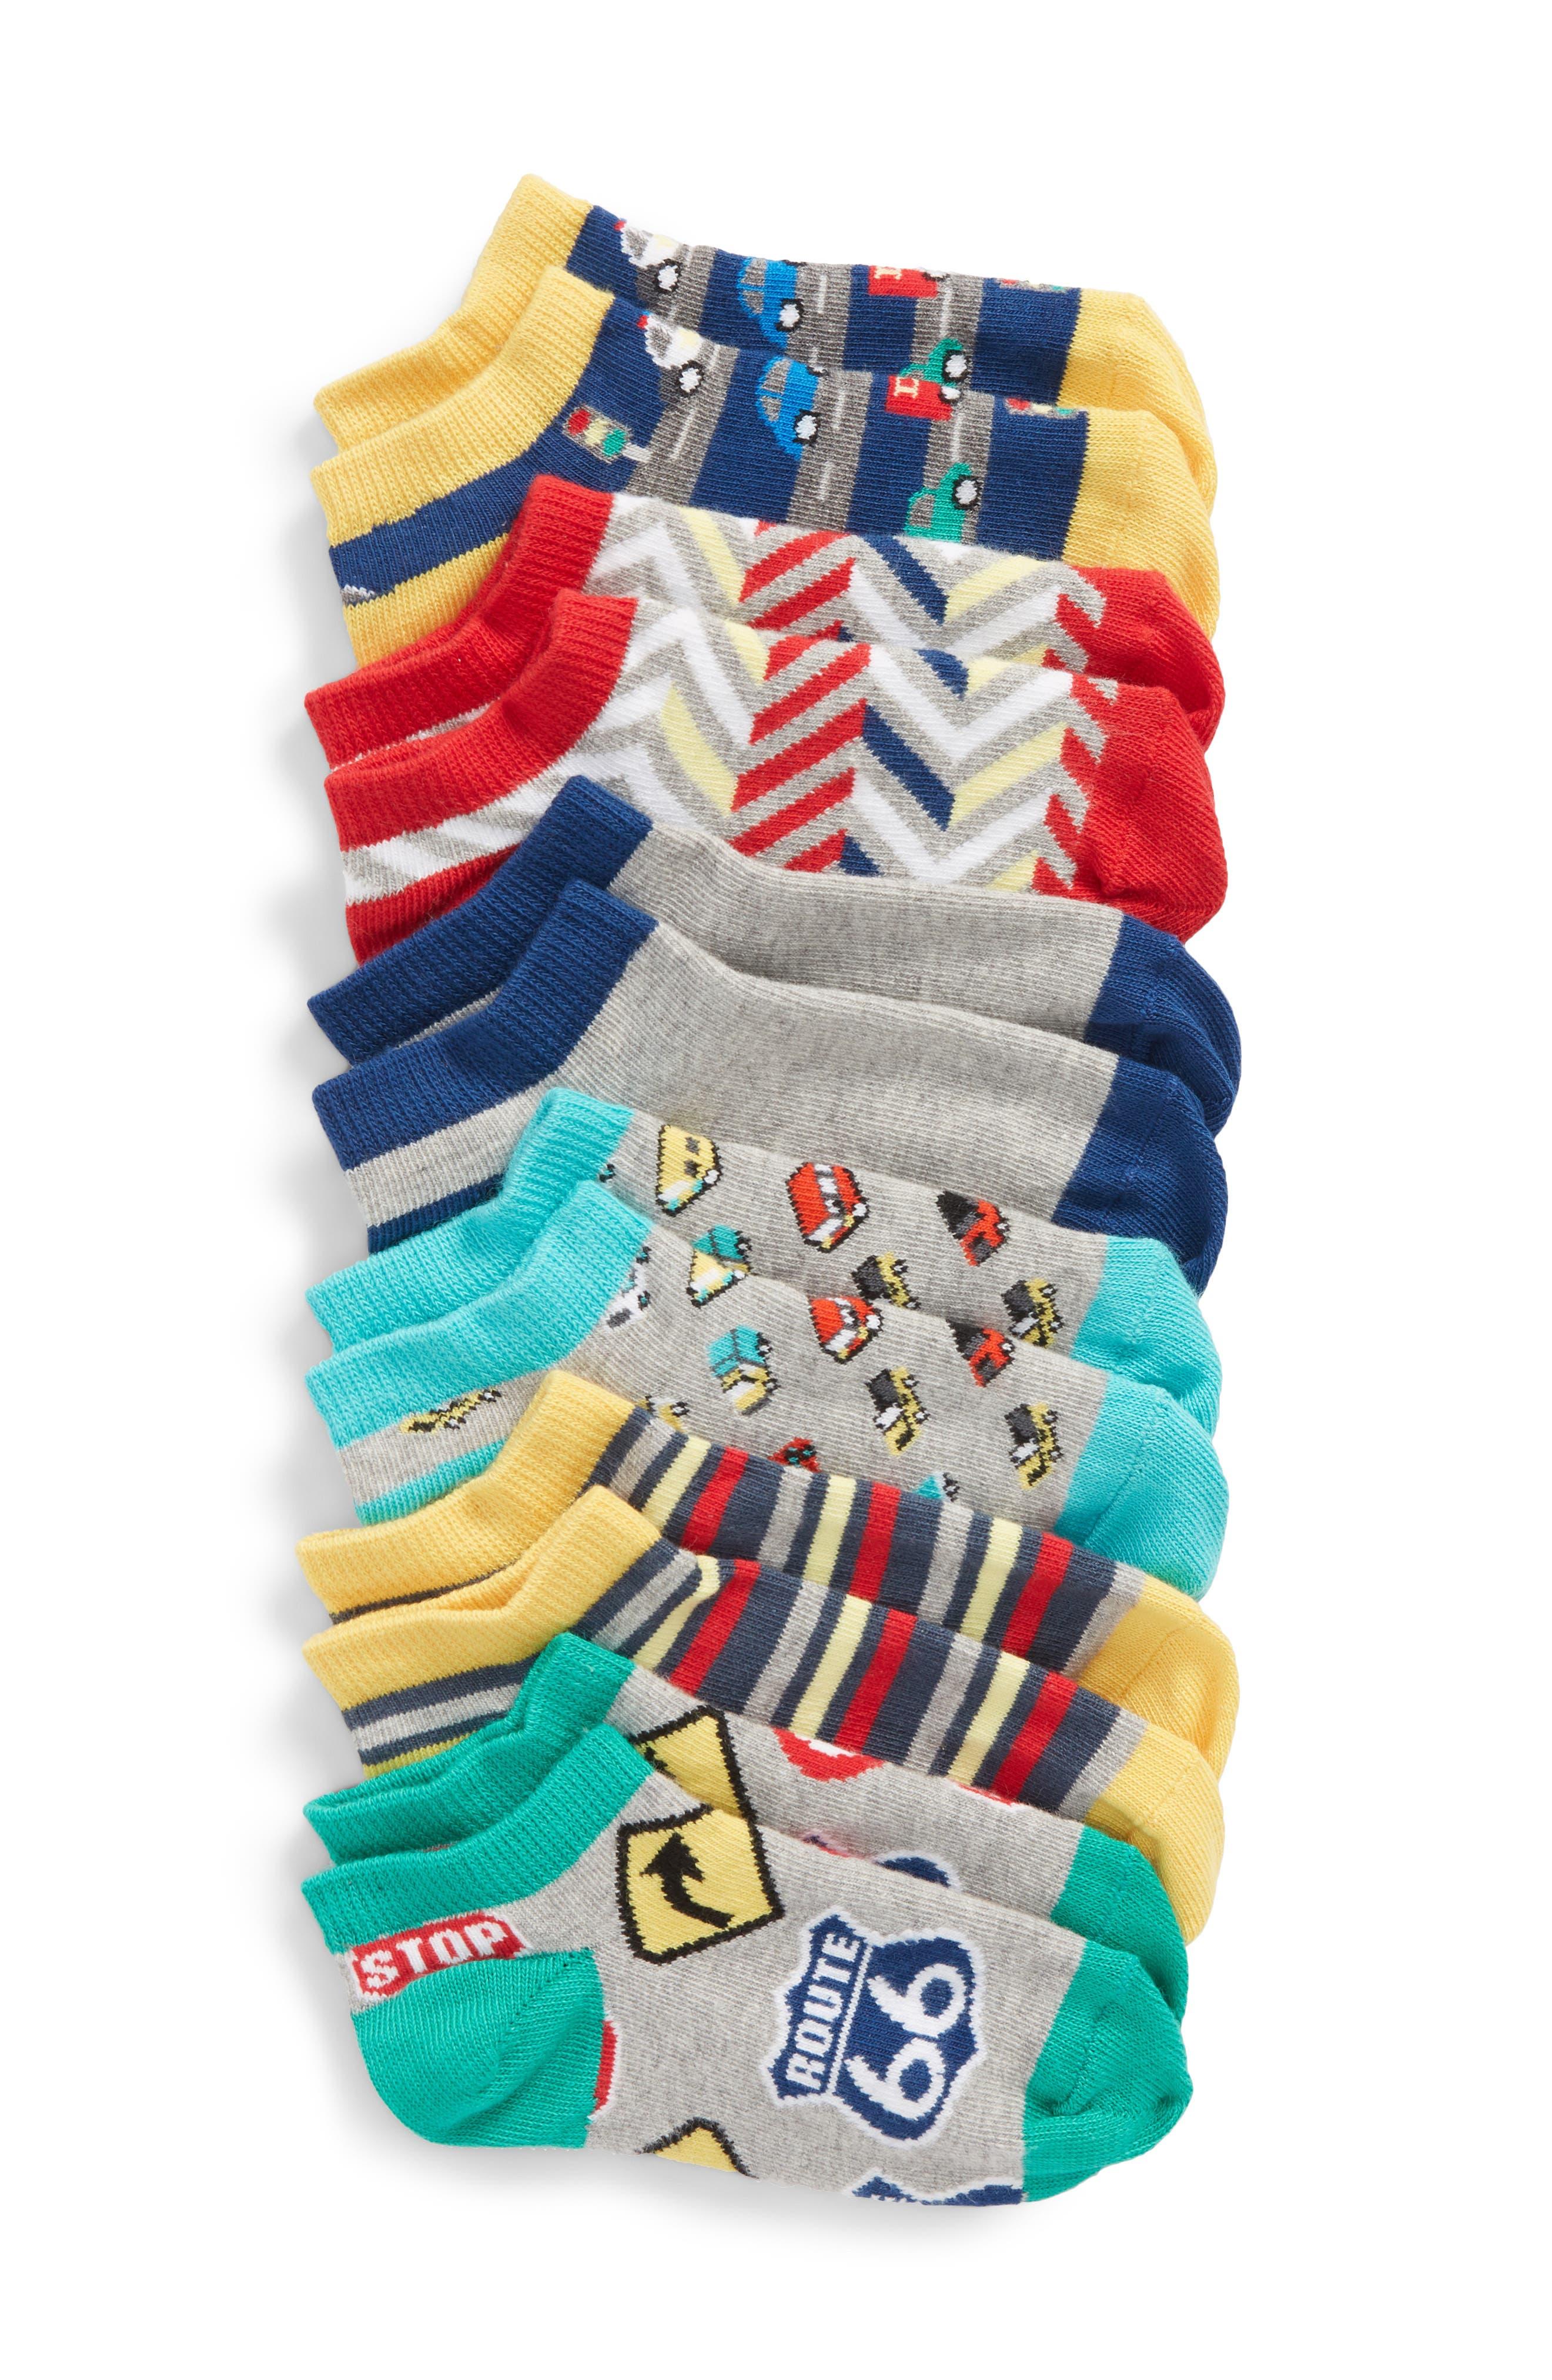 TUCKER + TATE 6-Pack Vehicle Low Cut Socks, Main, color, 096